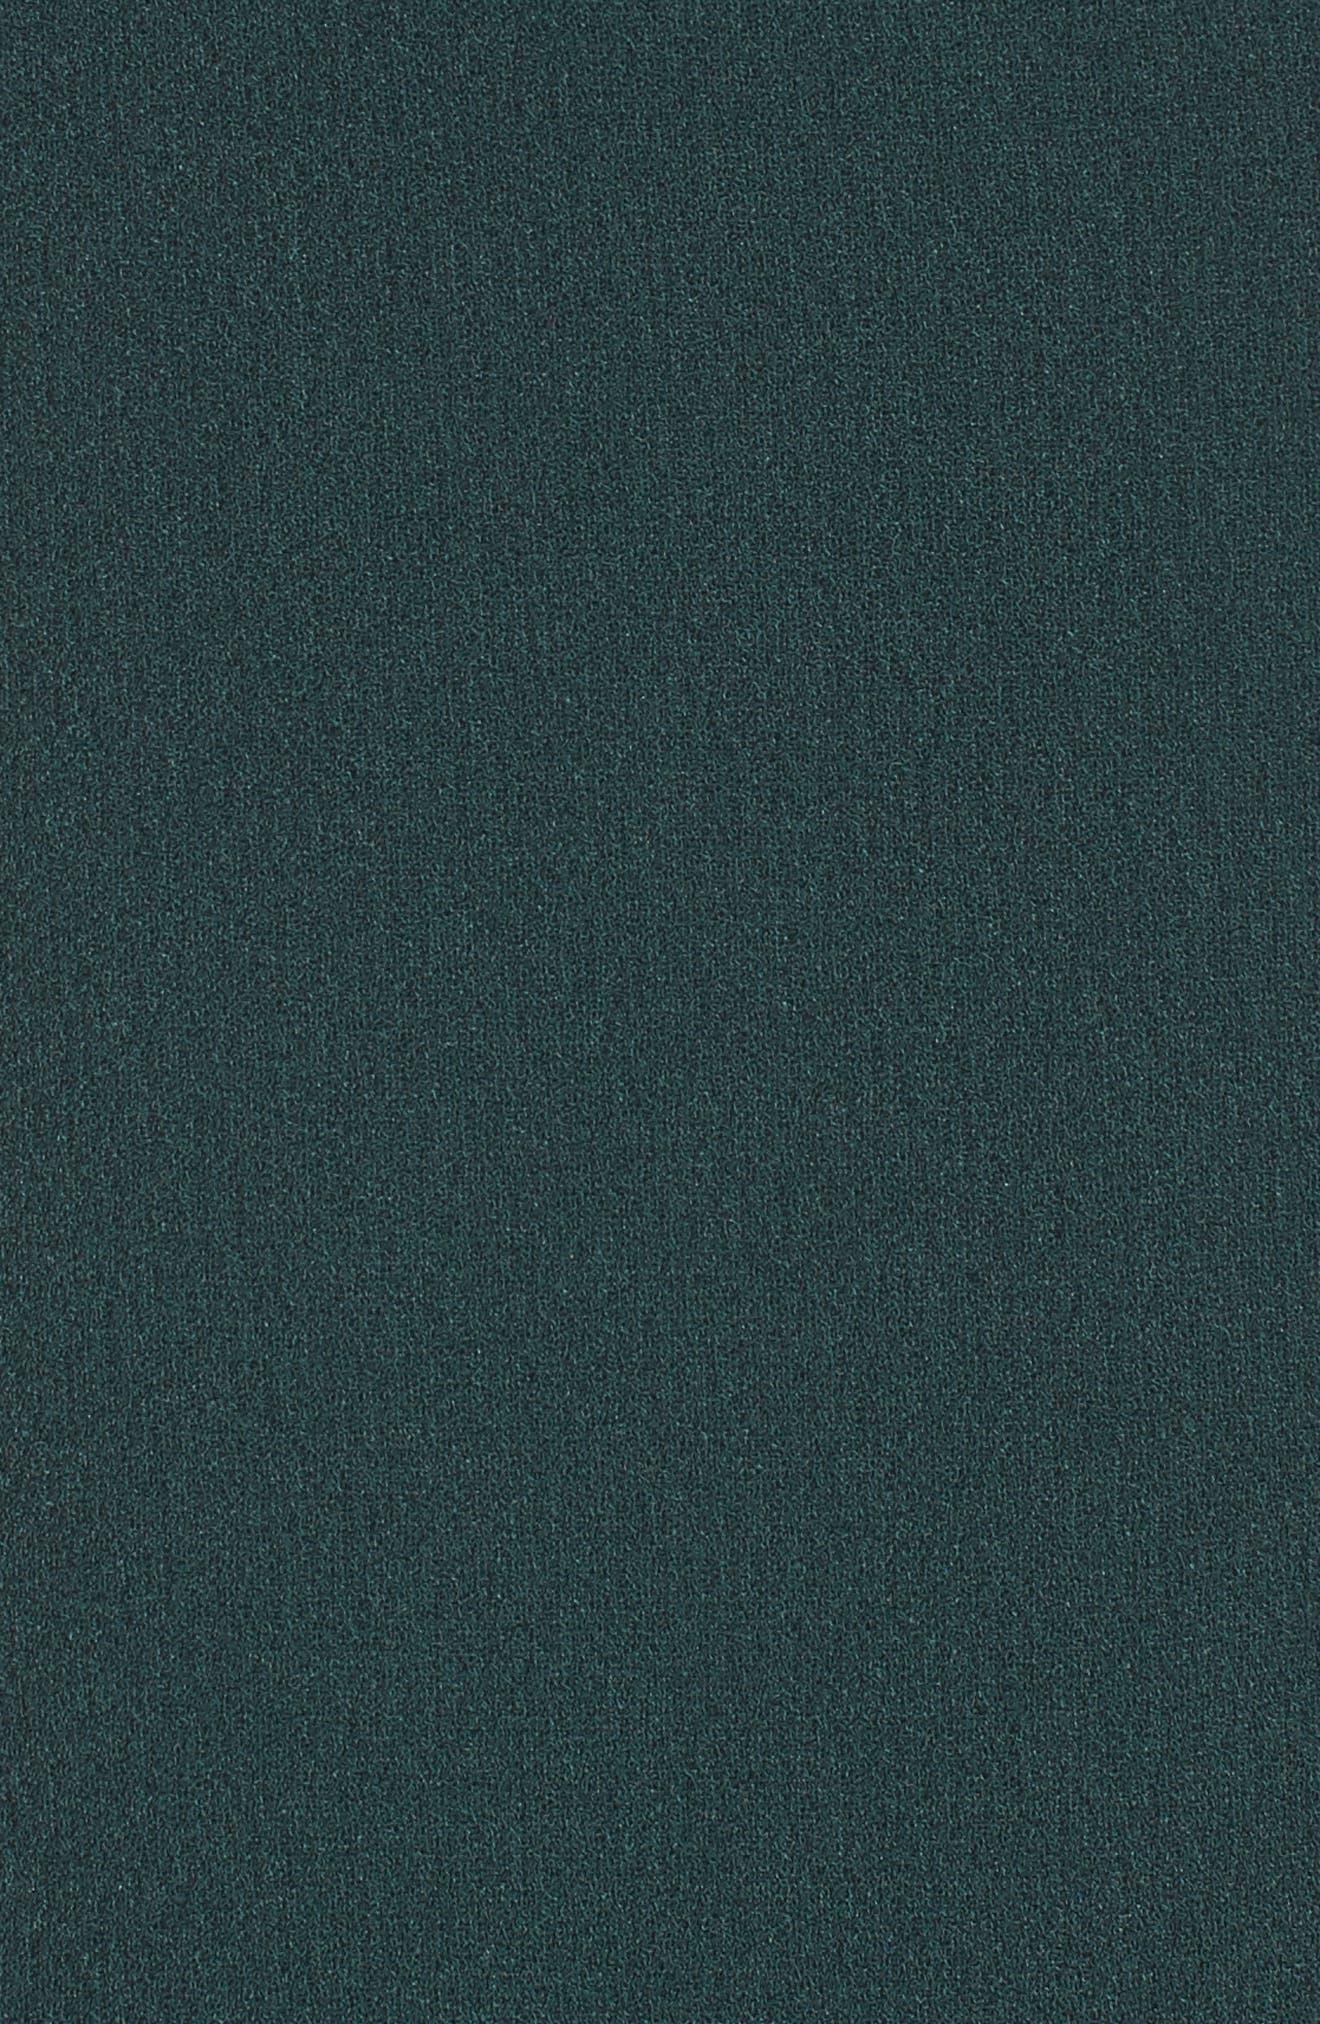 Hailey Crepe Dress,                             Alternate thumbnail 123, color,